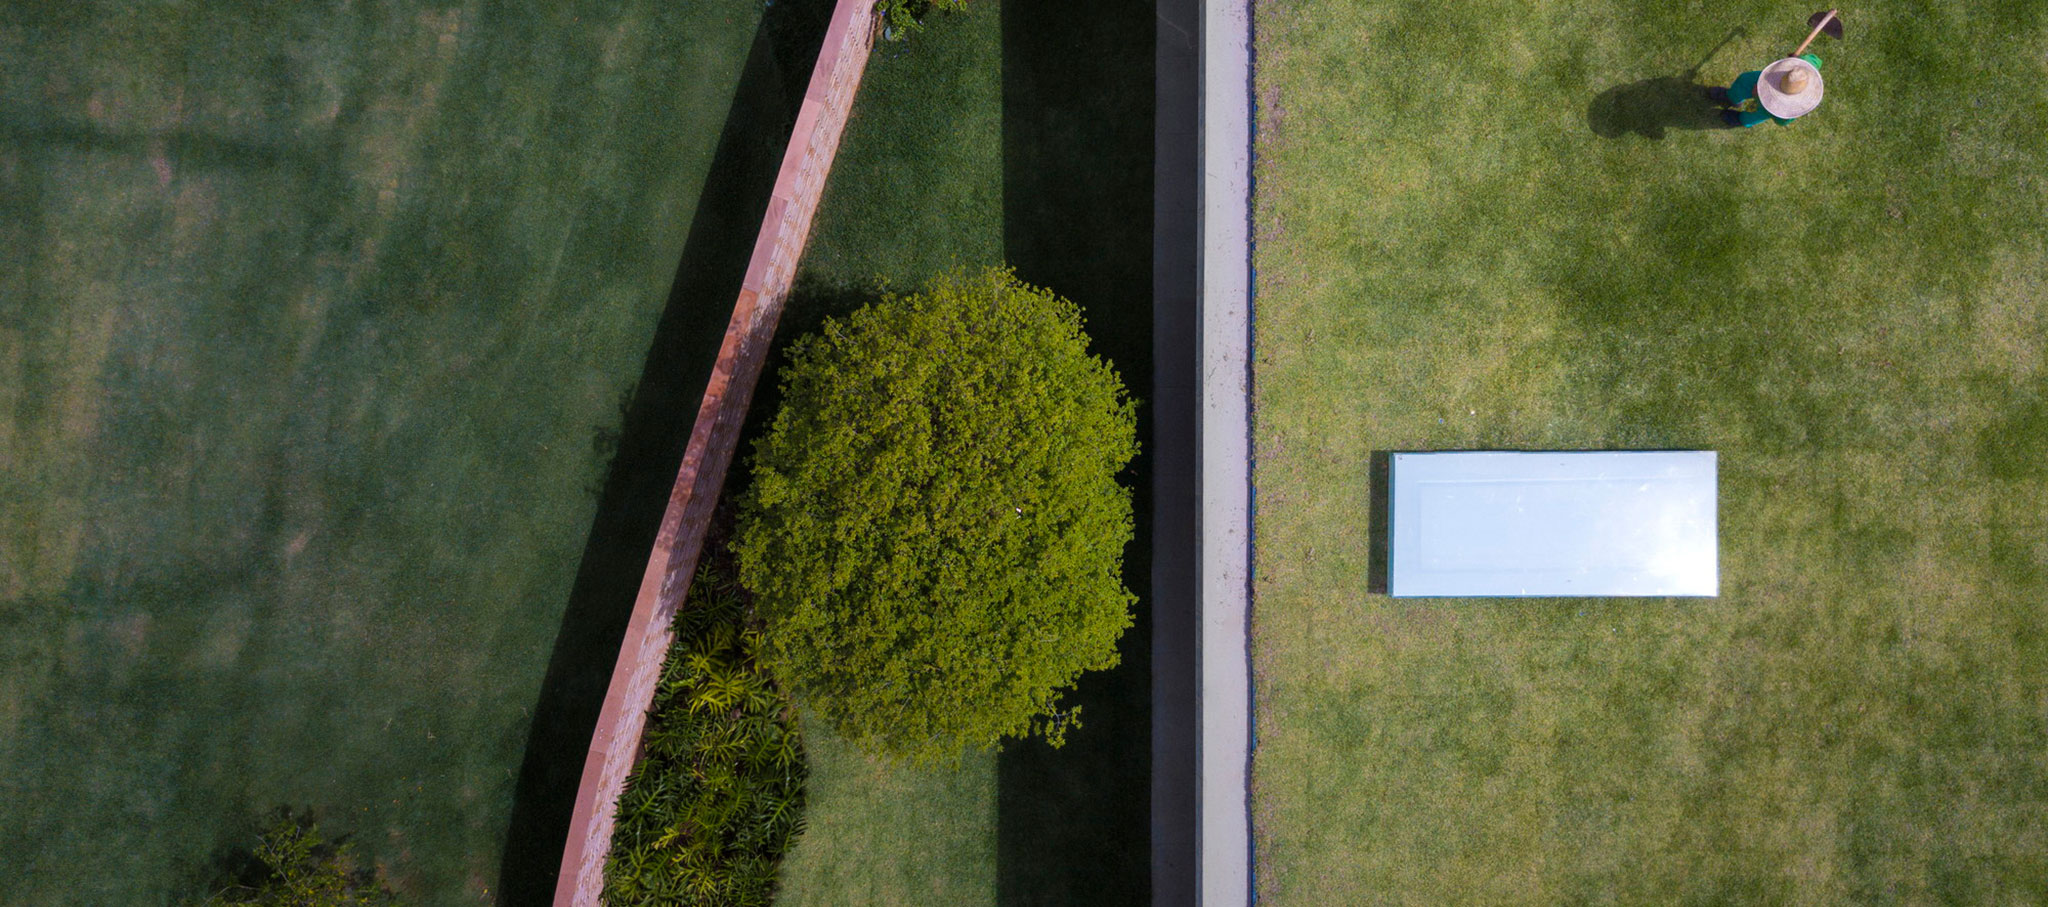 Planar House by Studio MK27 and Lair Reis, Photograph by Fernando Guerra. FG+SG